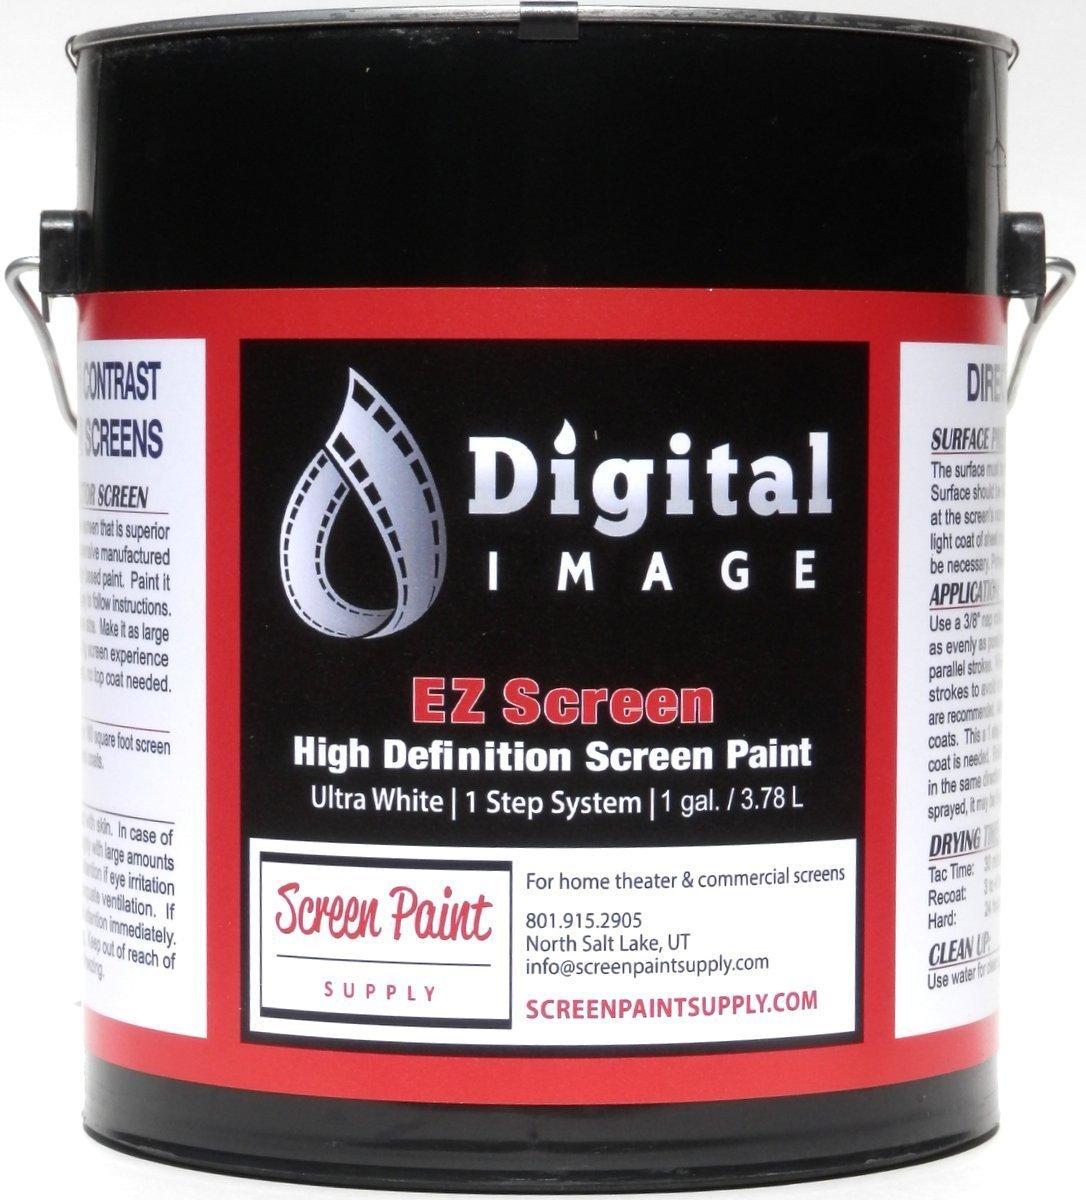 Projector Screen Paint - High Definition - EZ Screen White - Gallon